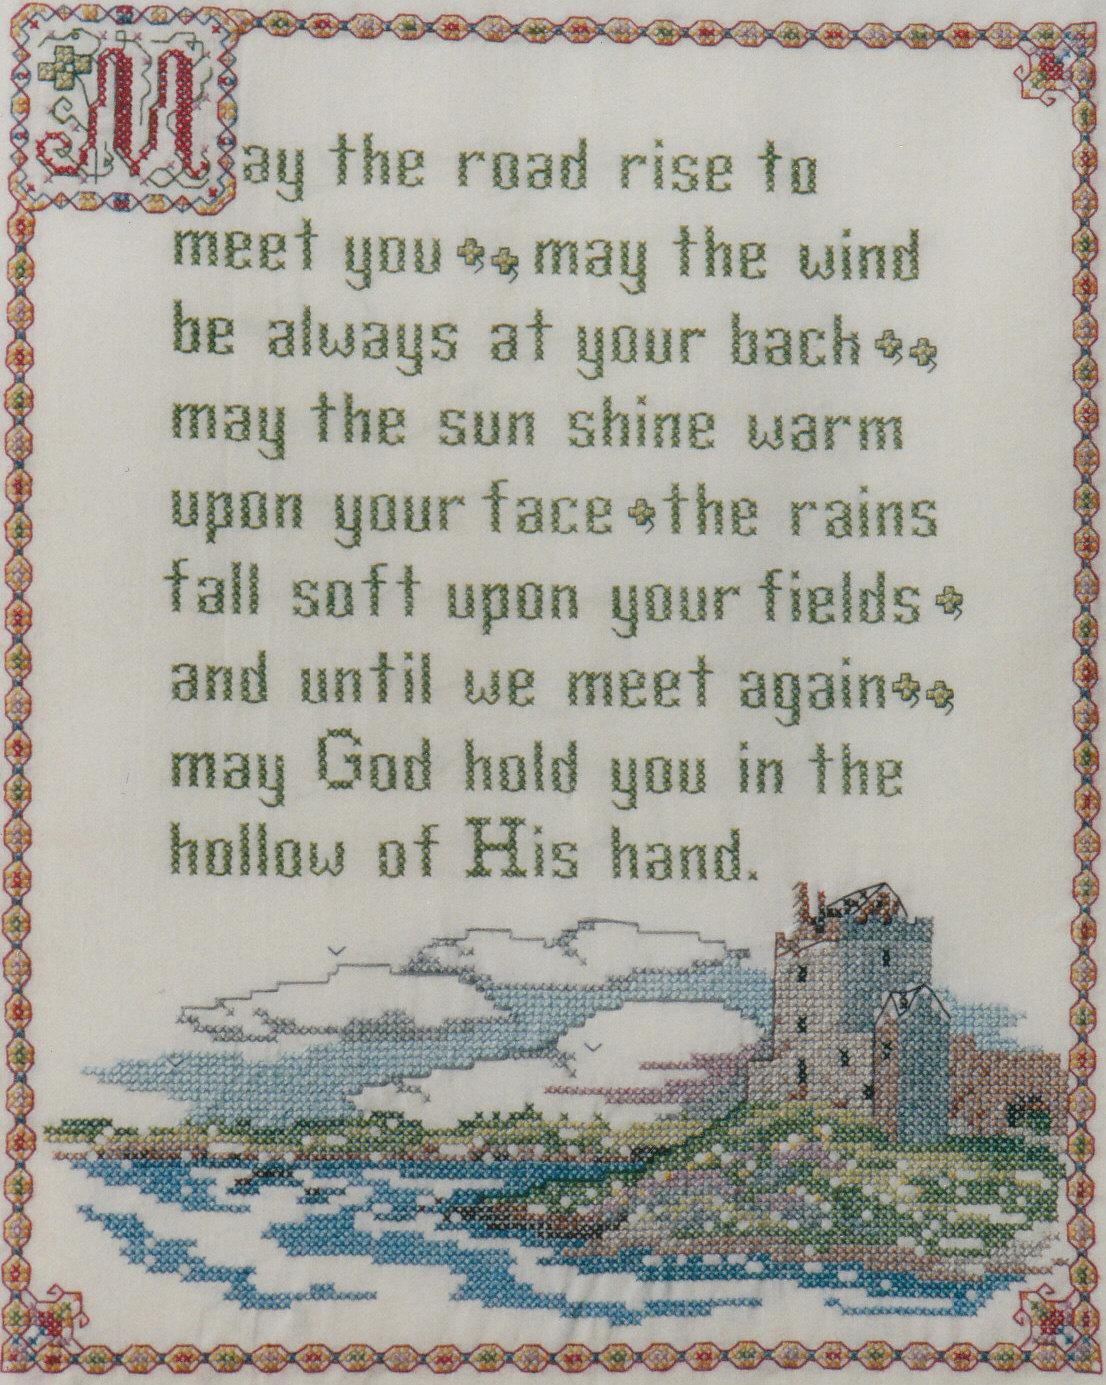 Irish Blessing | Melitastitches4fun\'s Blog